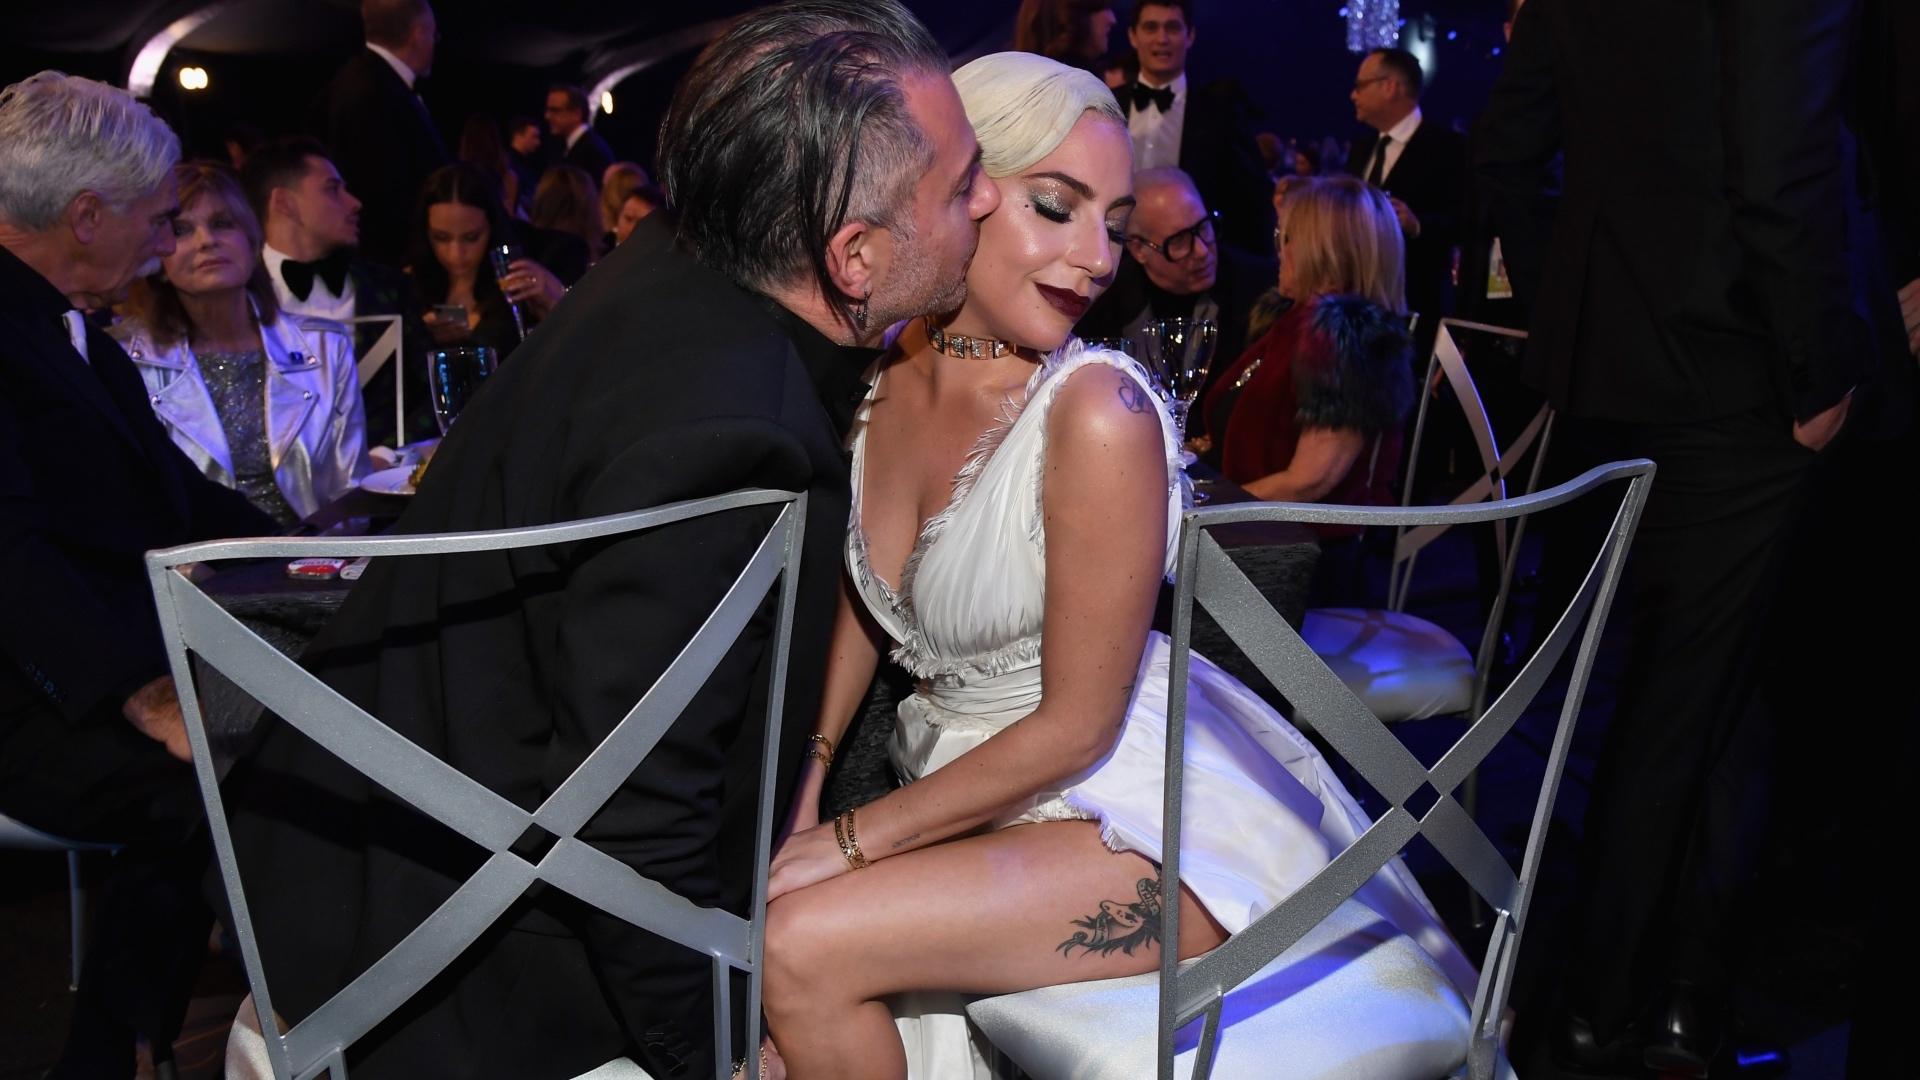 Gagas who is husband lady Lady Gaga's